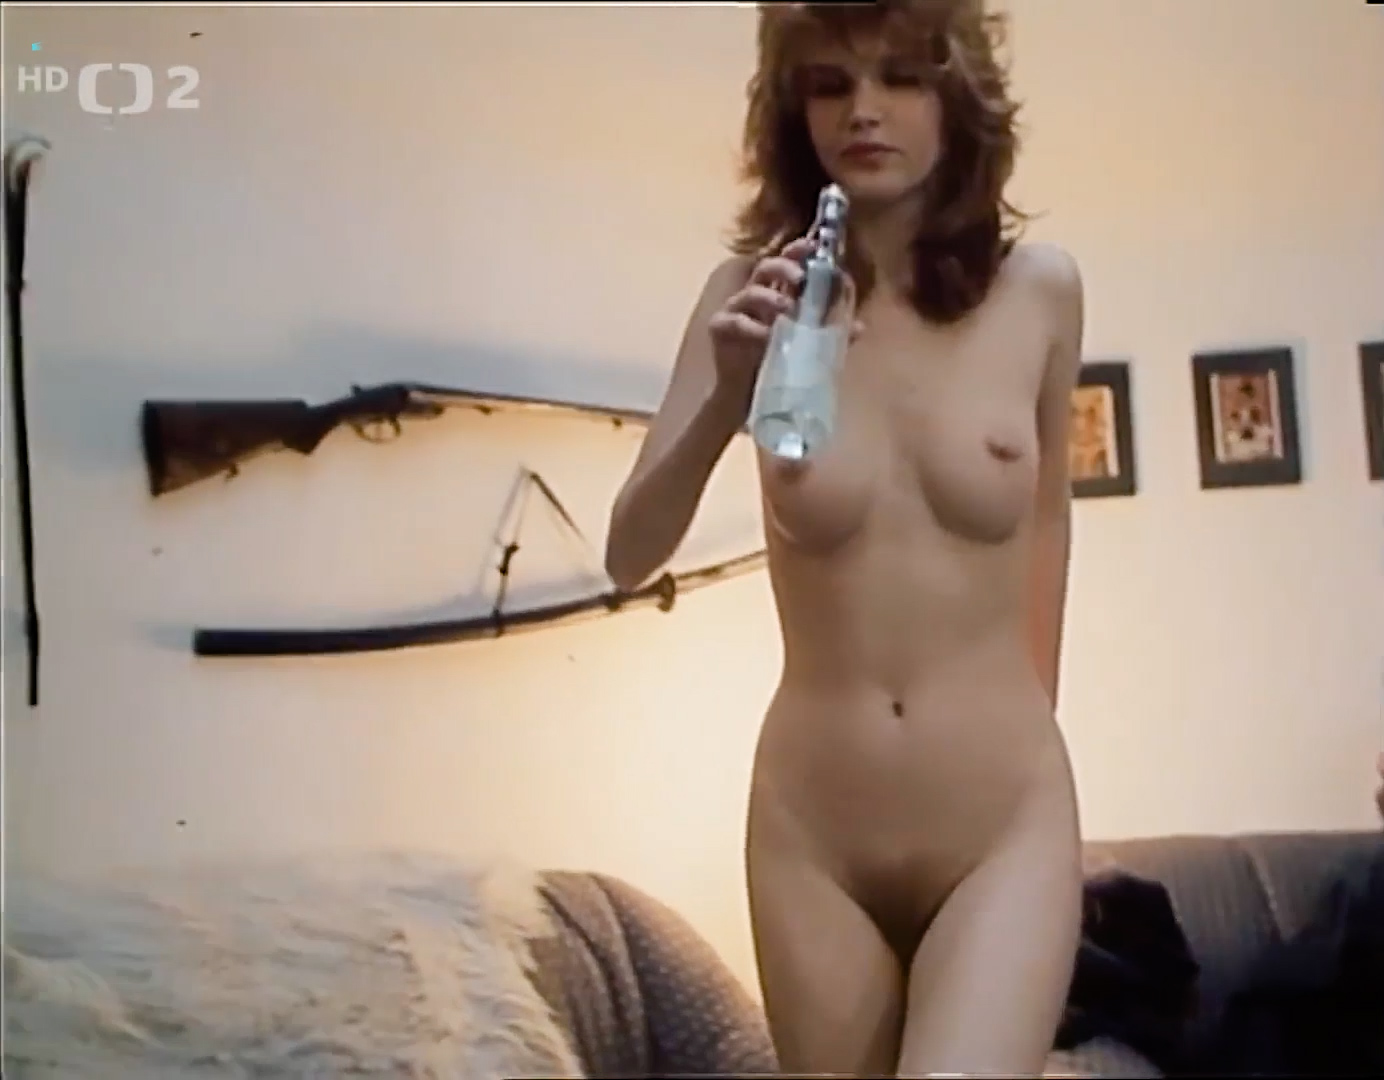 Amanda Logue Nude amanda logue nude pictures gallery-312   my hotz pic